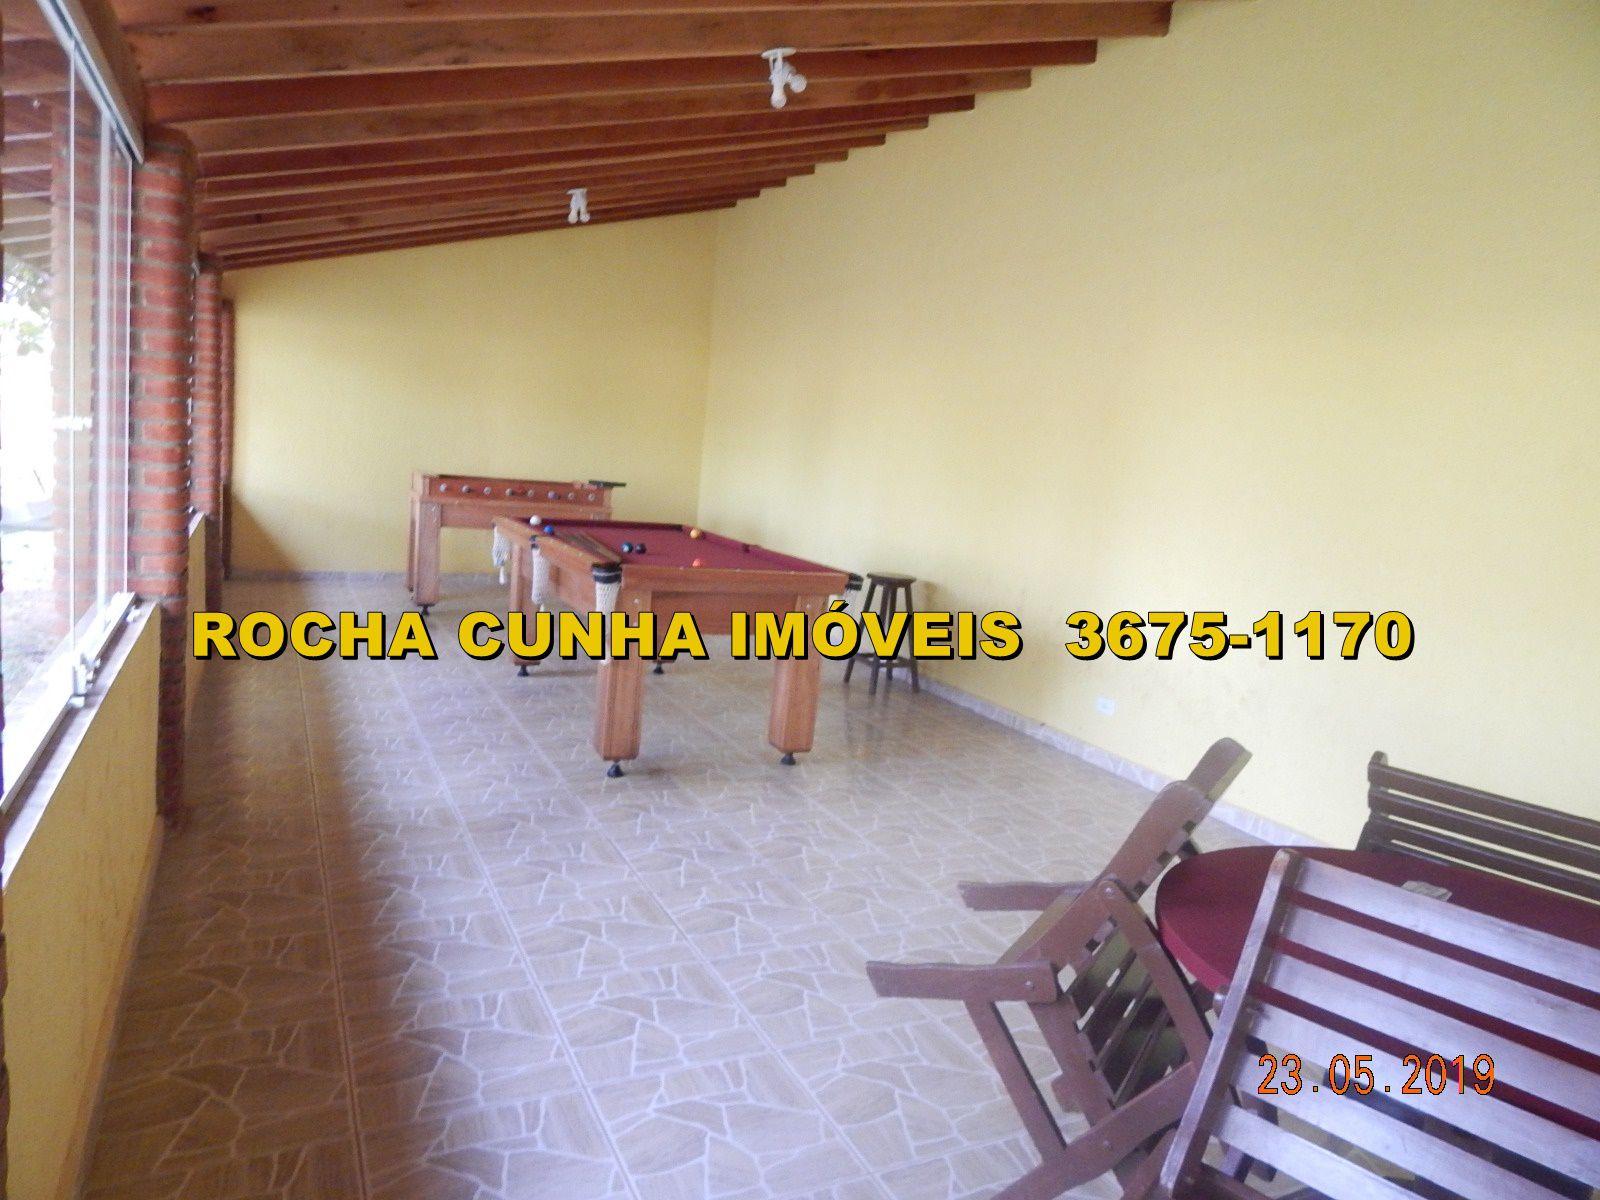 Chácara à venda Santana de Parnaíba,SP - R$ 780.000 - CHACARA0010 - 5